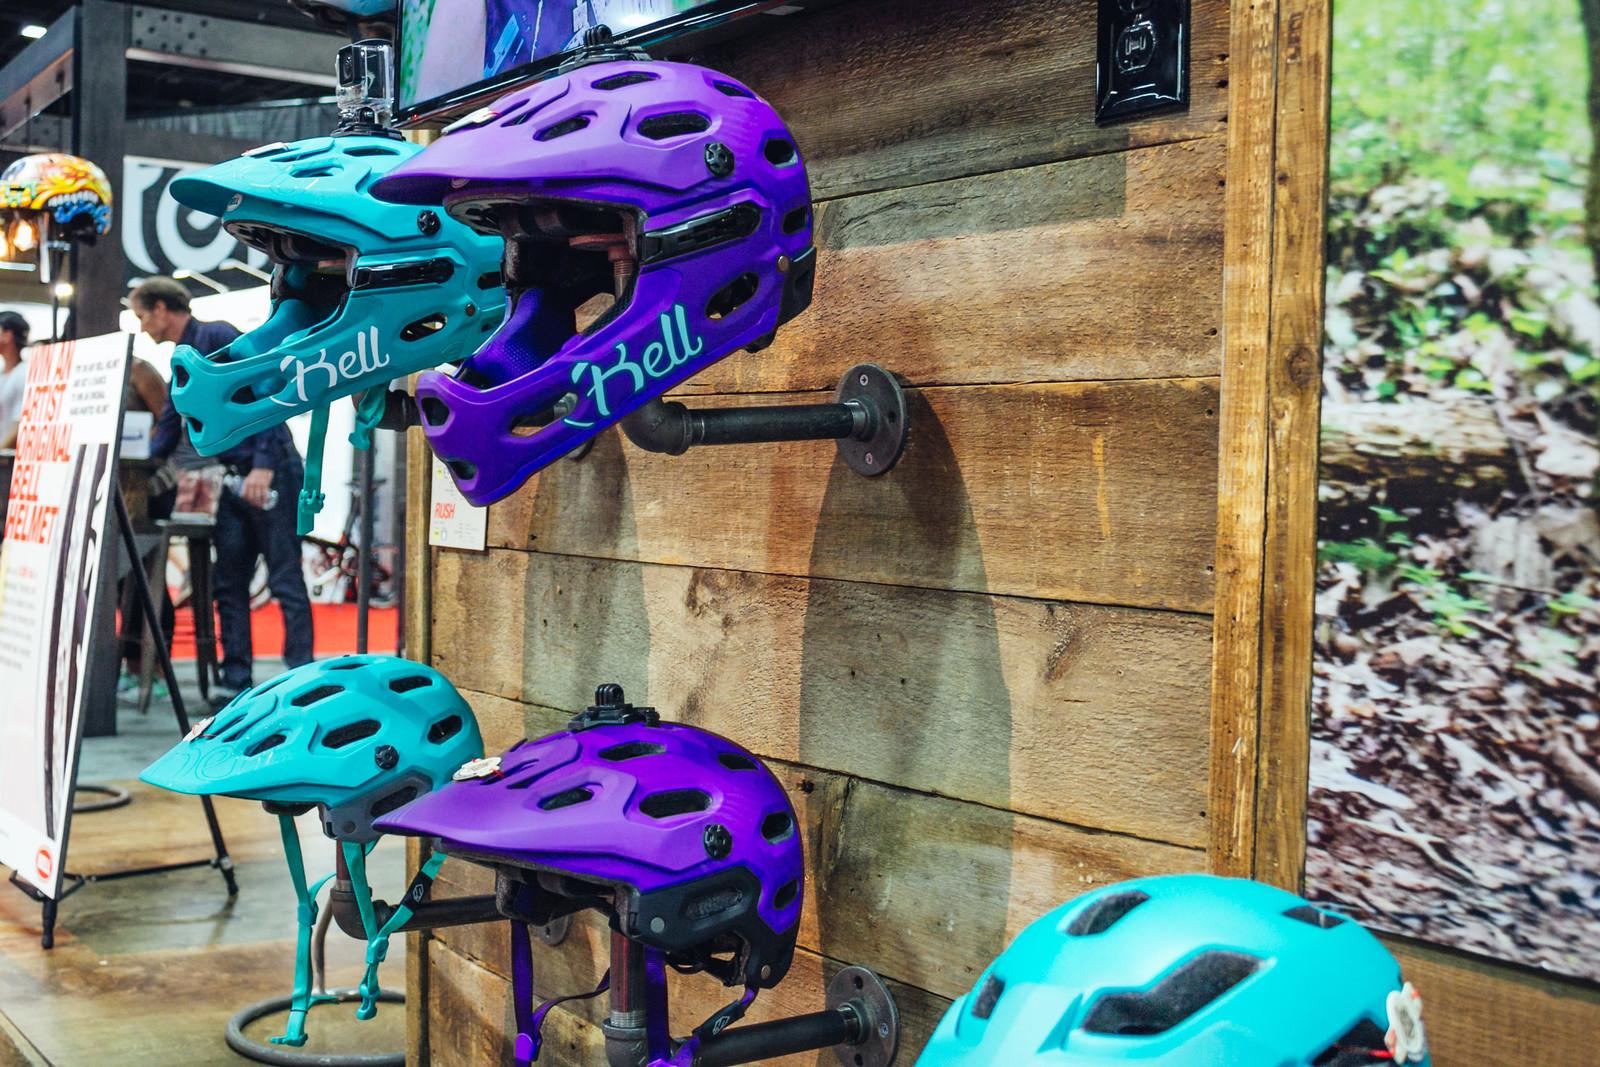 2017 Bell Joy Ride Women's Collection Super 3 and Super 3R Helmets - INTERBIKE - 2017 Women's Mountain Bike Gear - Mountain Biking Pictures - Vital MTB